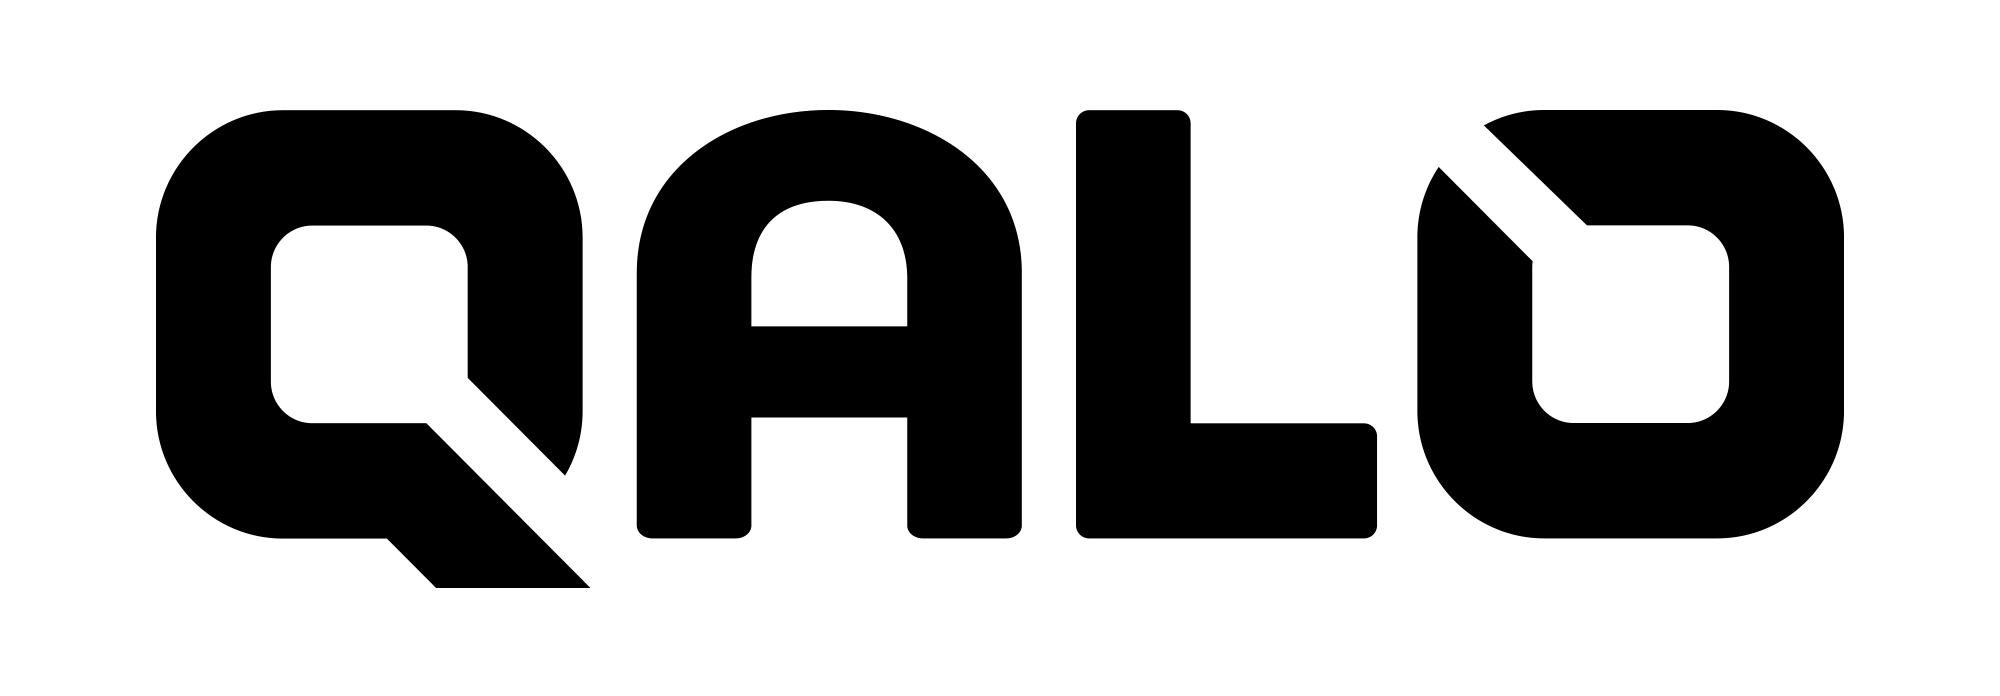 Logo-QALO-crop.jpg